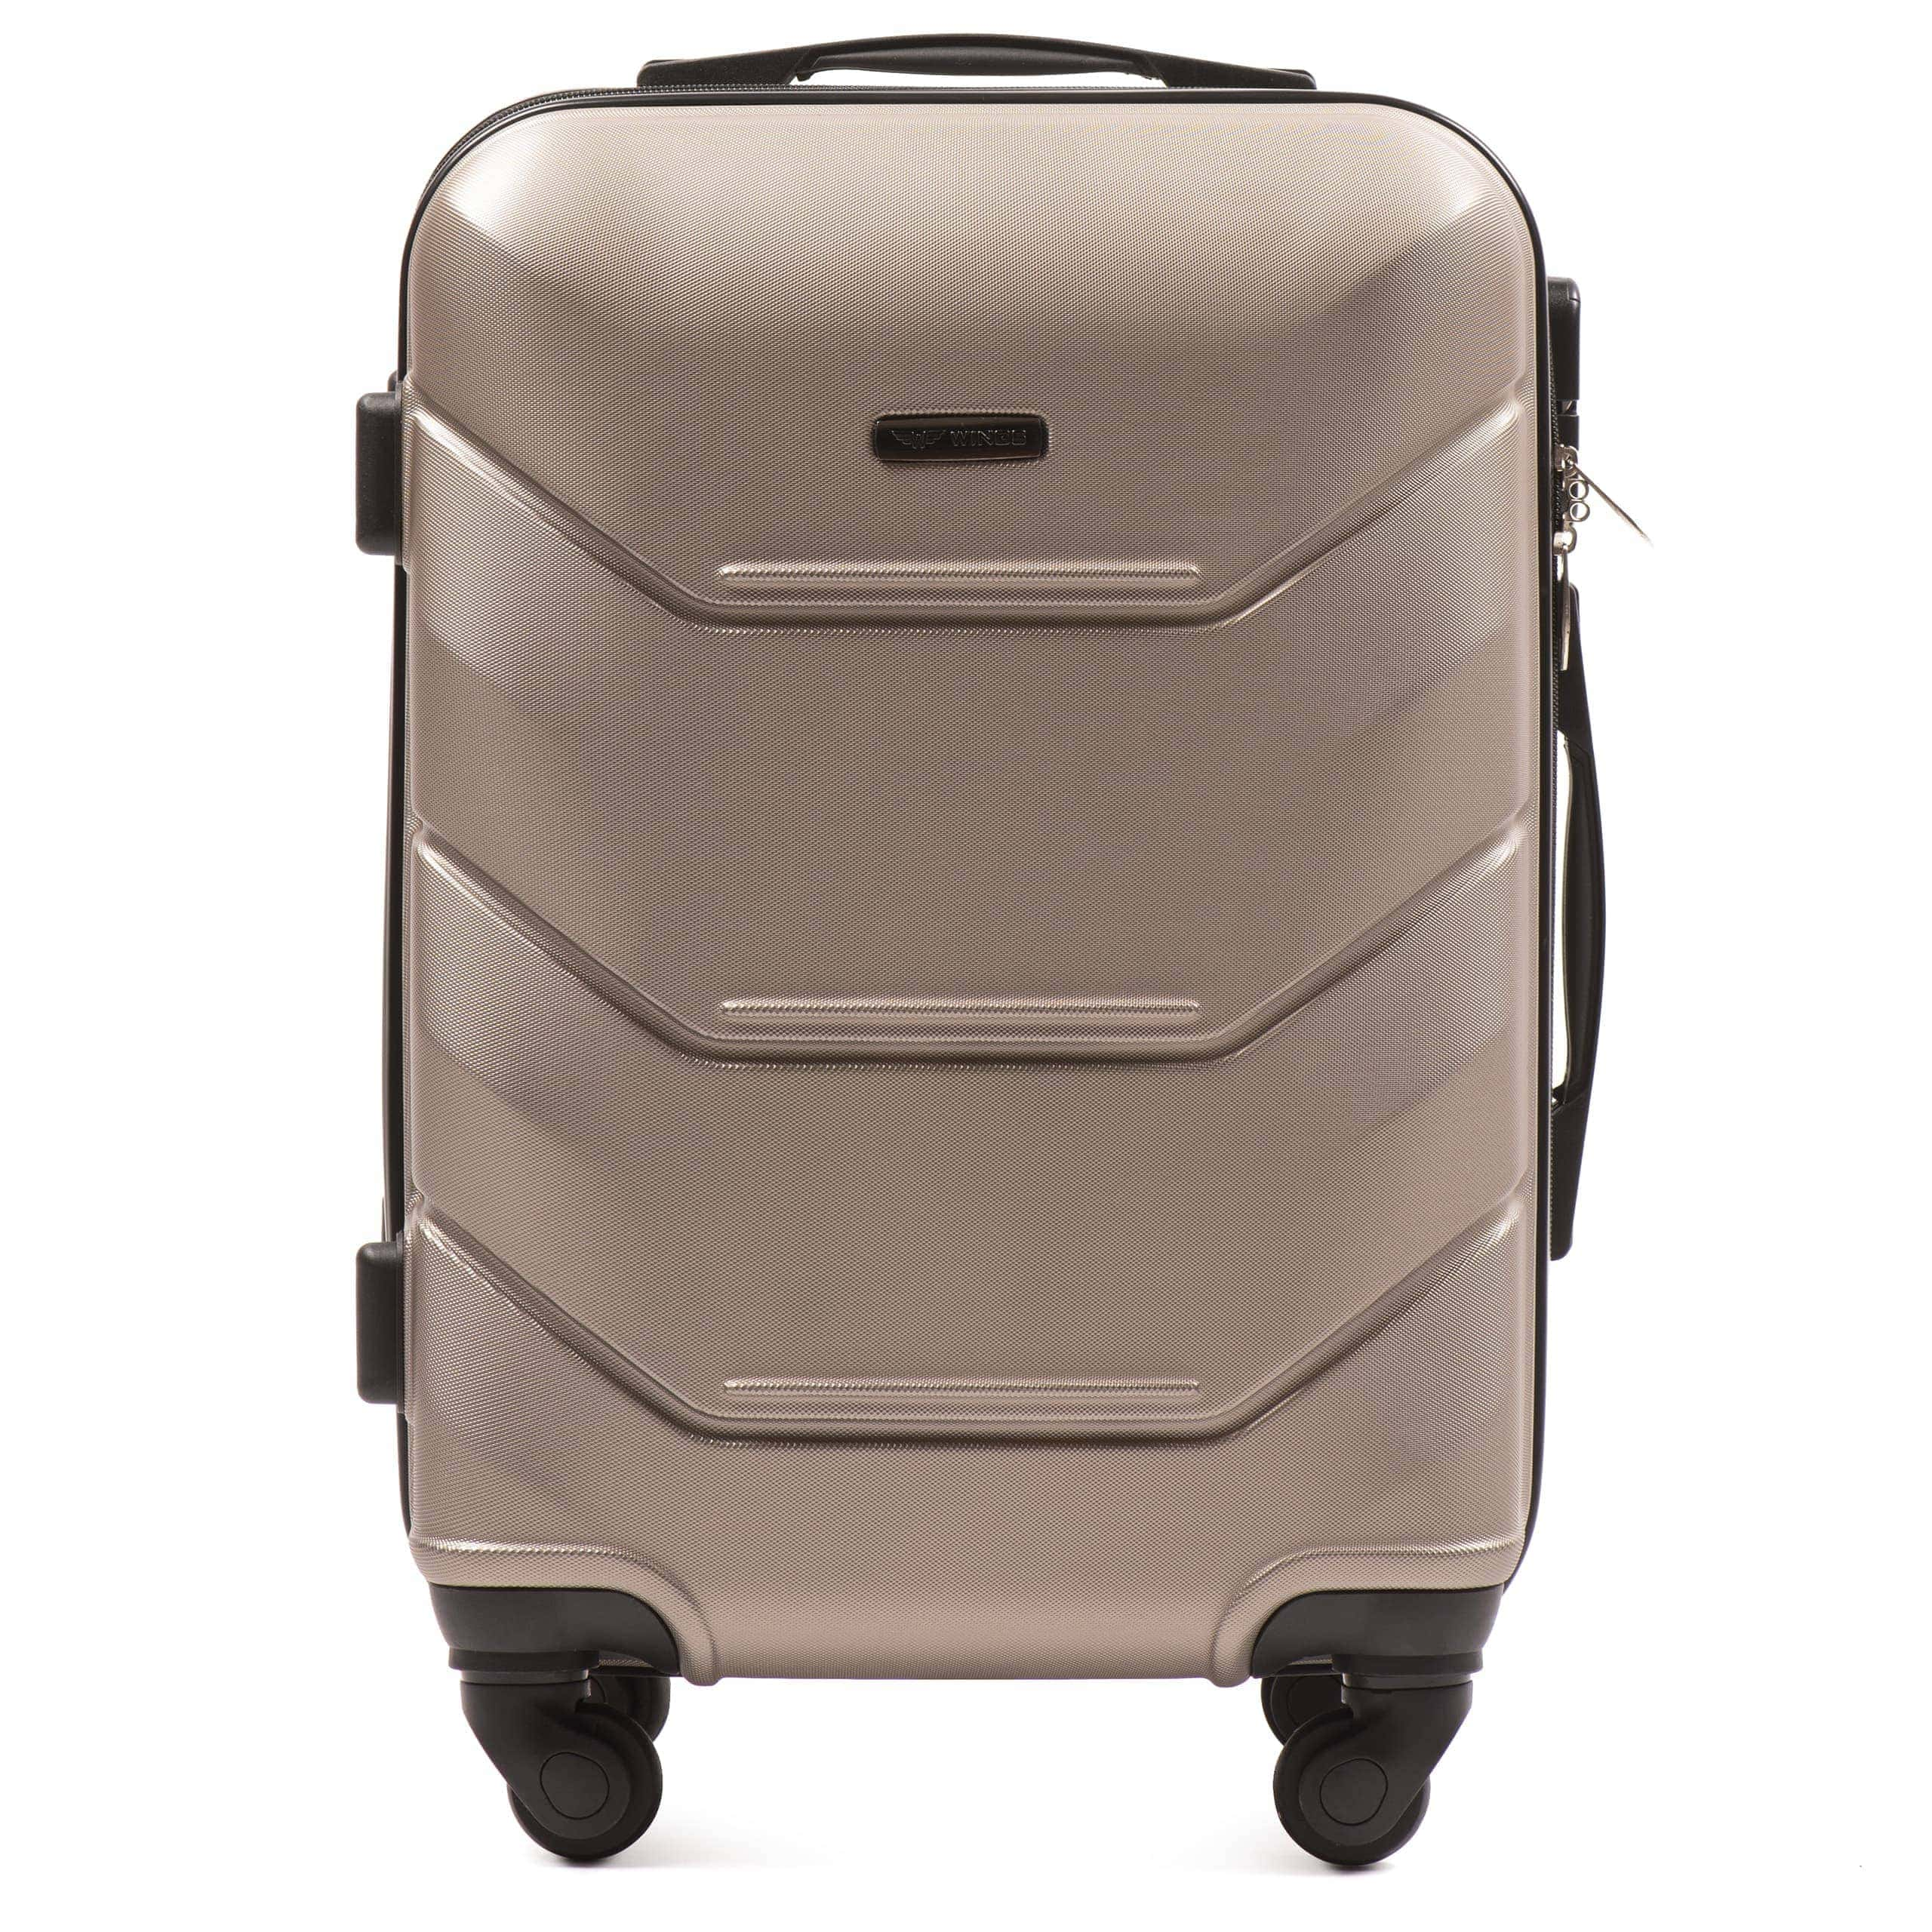 Valiza mica WINGS 147 S Champany Premium pe 4 roti din cauciuc!Pt bagaj,pina la 7/10 kg